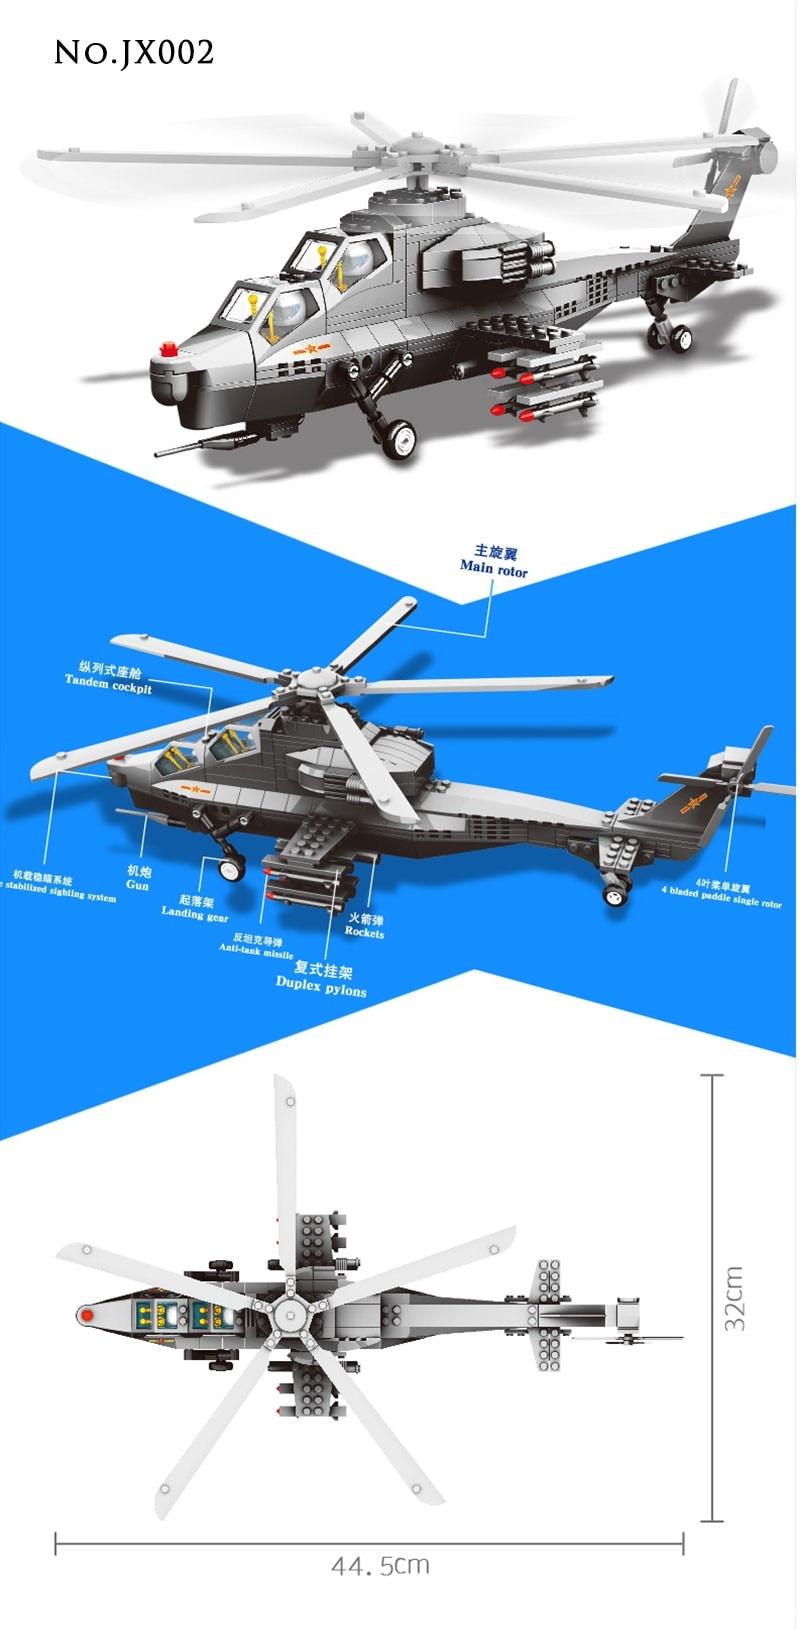 Wange Building Blocks Military F15 Fighter J-15 V-22 Osprey Tiltrotor Aircraft Helicopter Model Building Kits Toys For Children 2